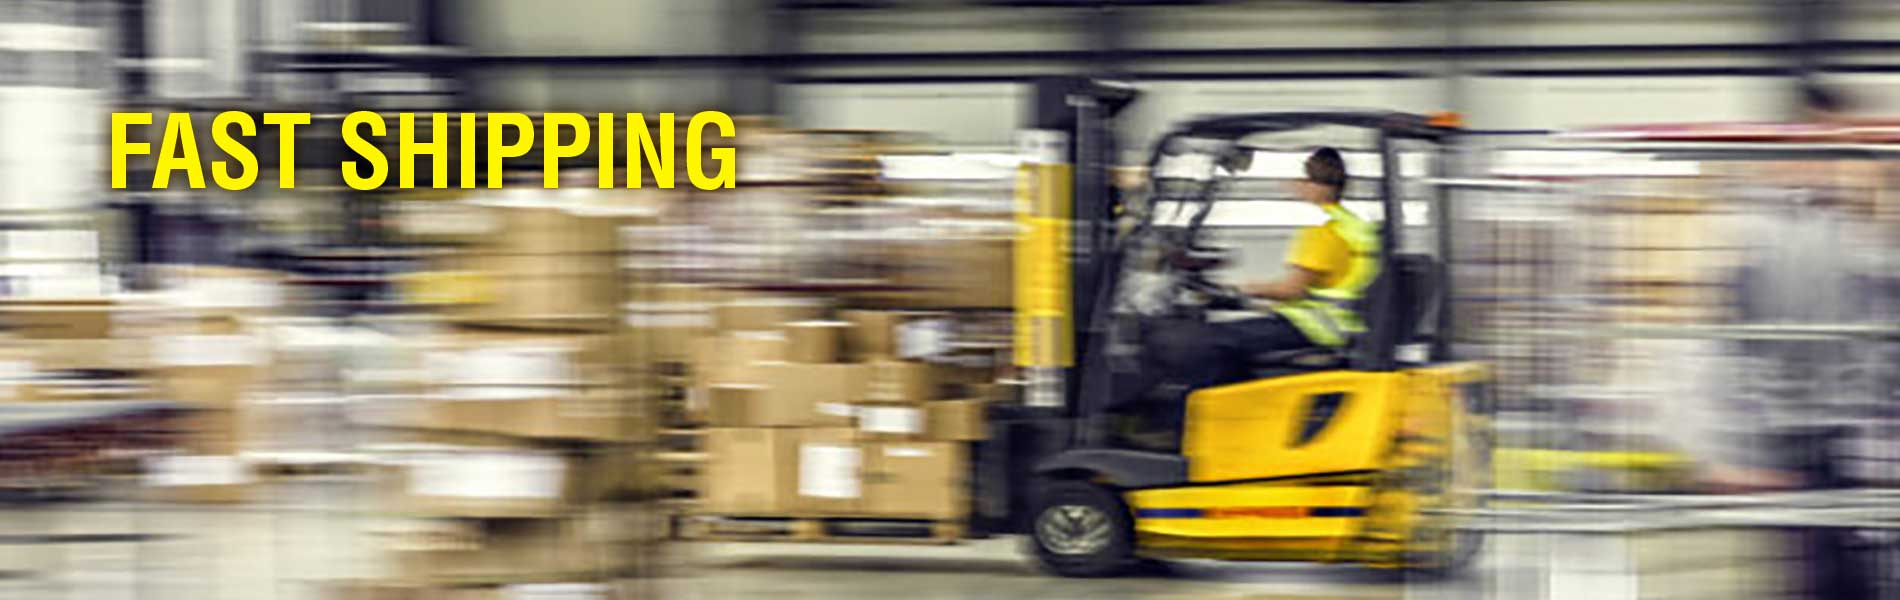 2021_tnn_team_fast_shiping